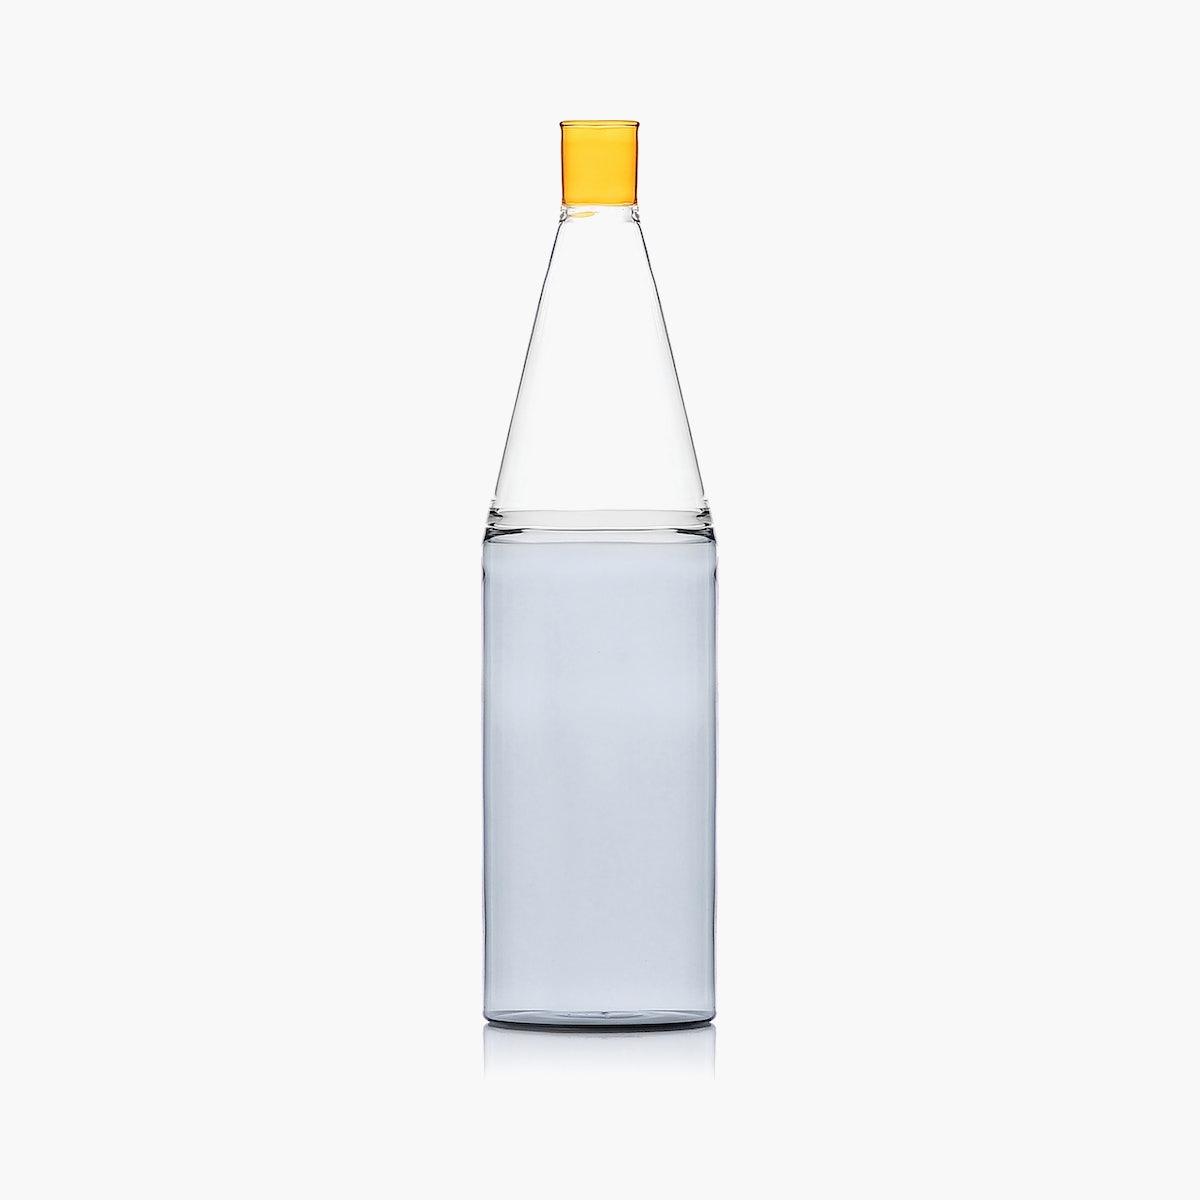 Tequila Sunrise Bottle